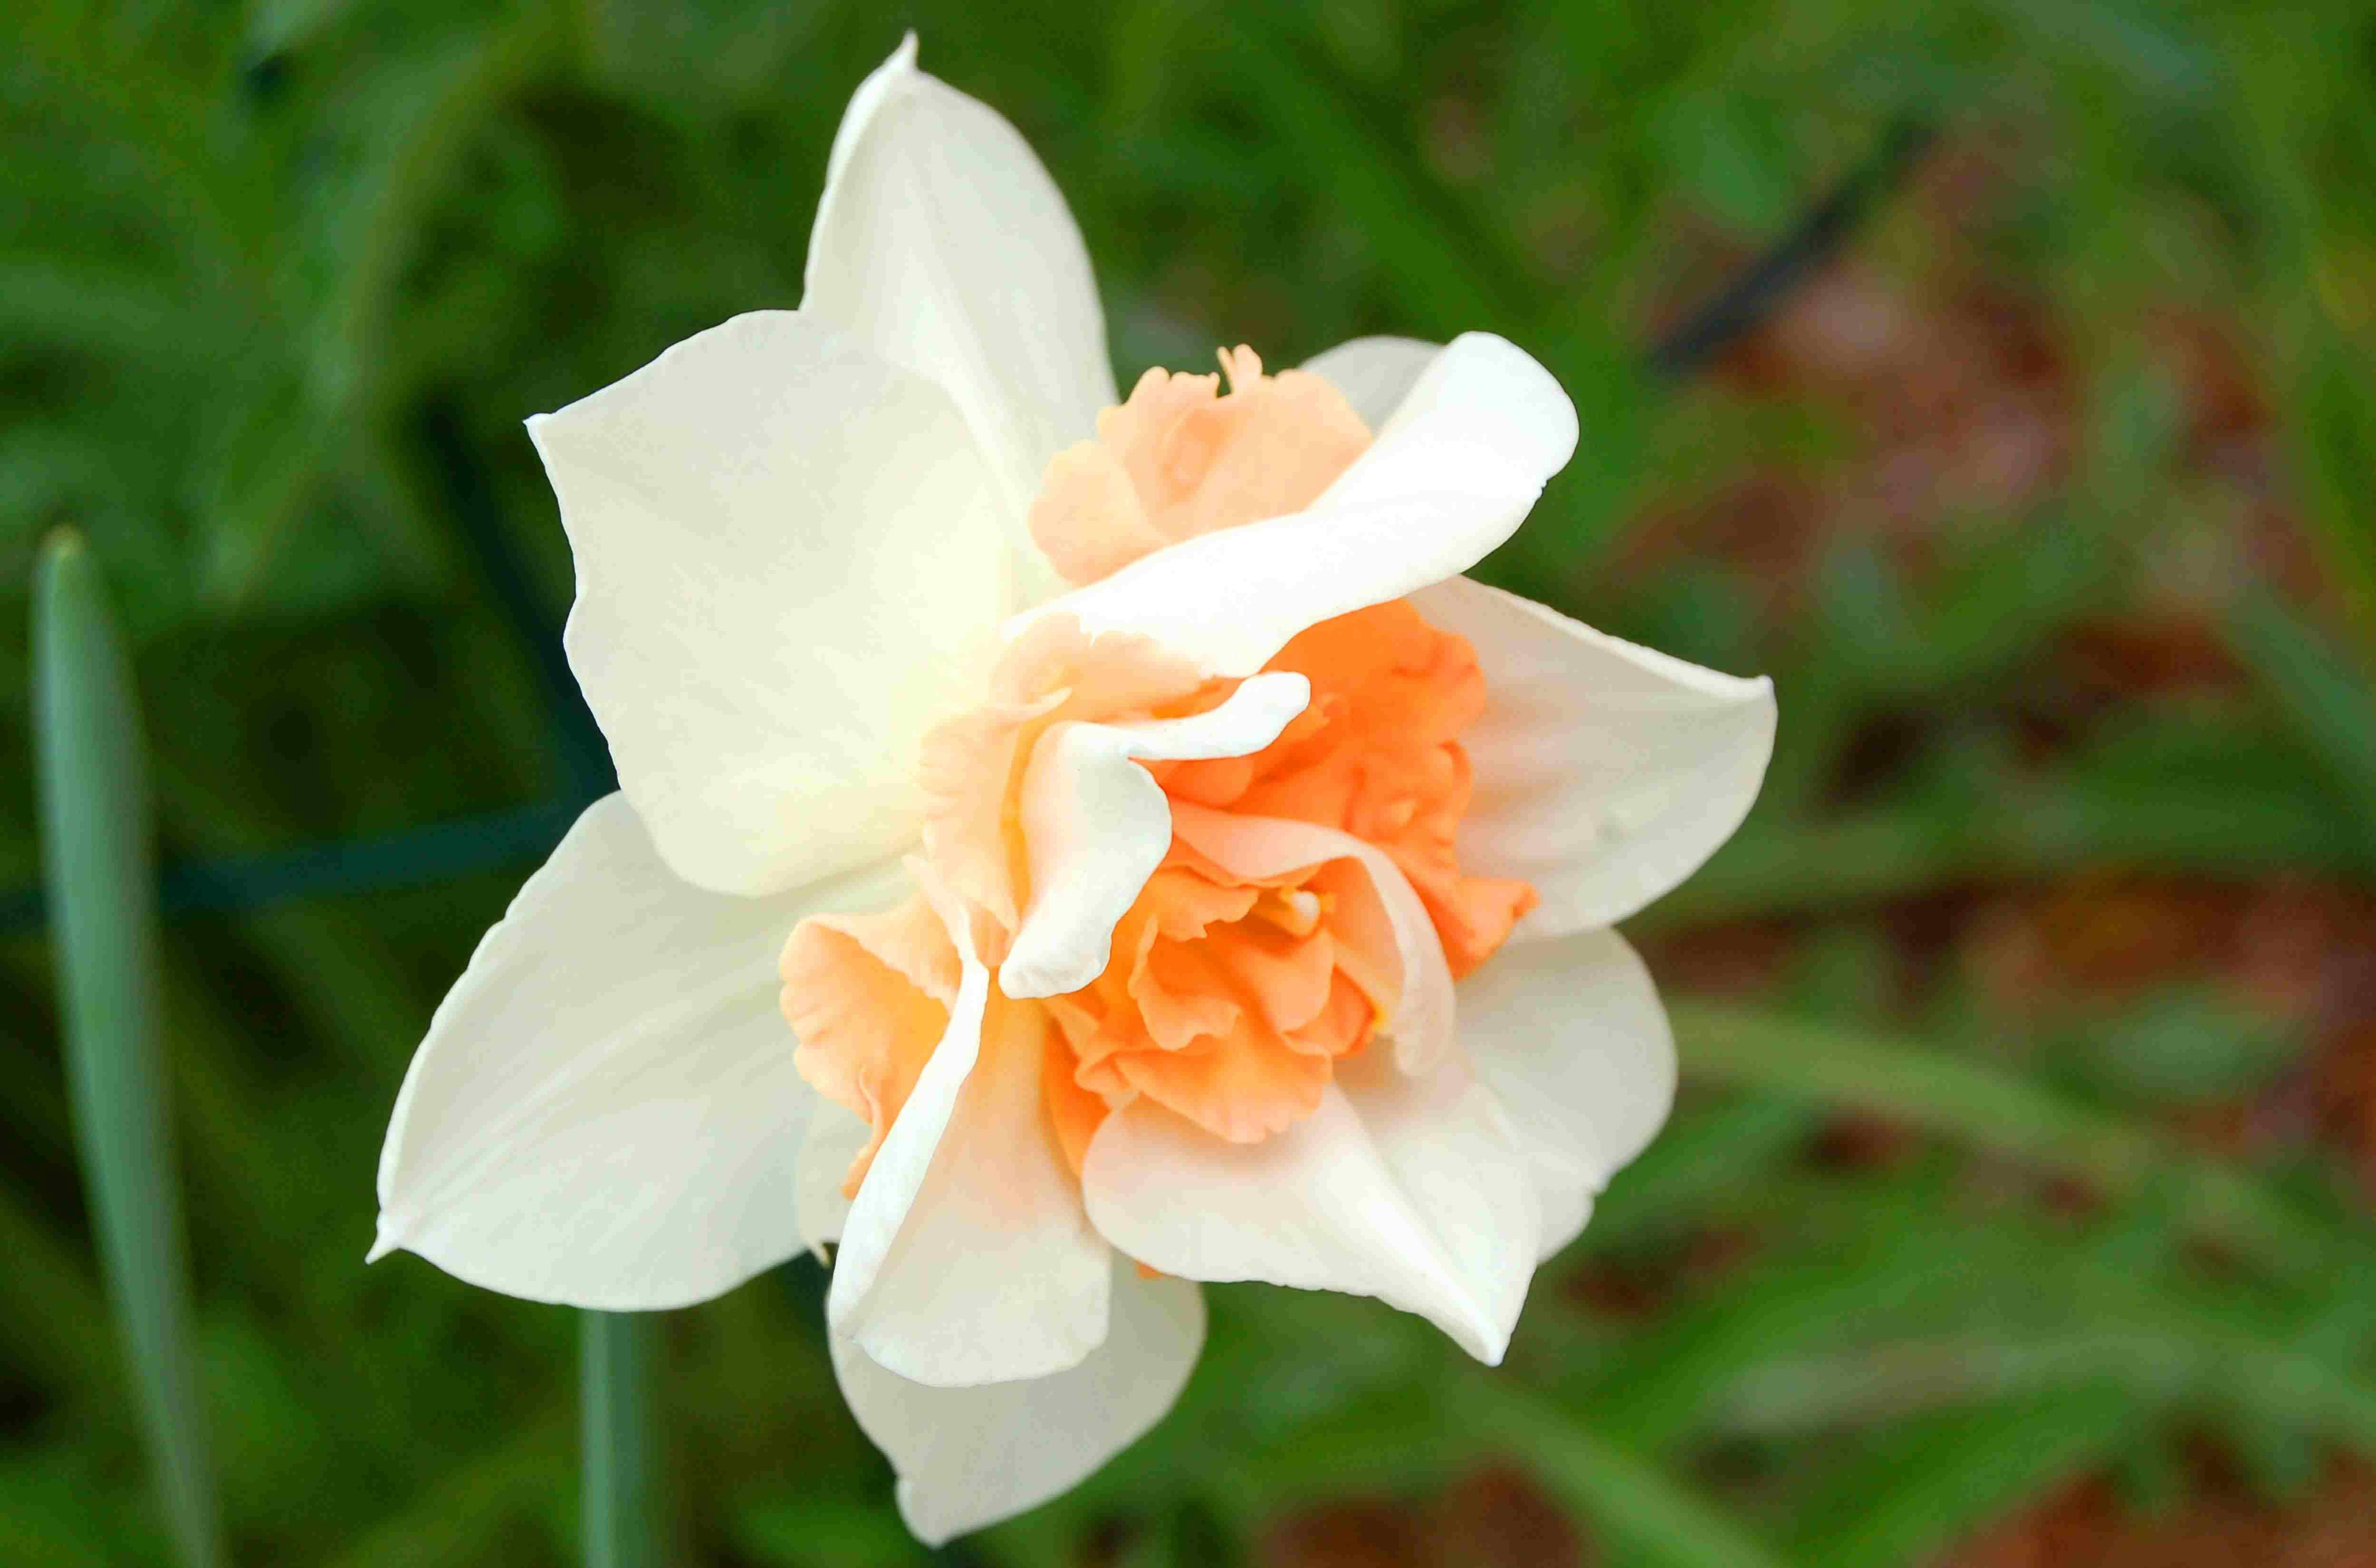 Narcissus Replete flower.